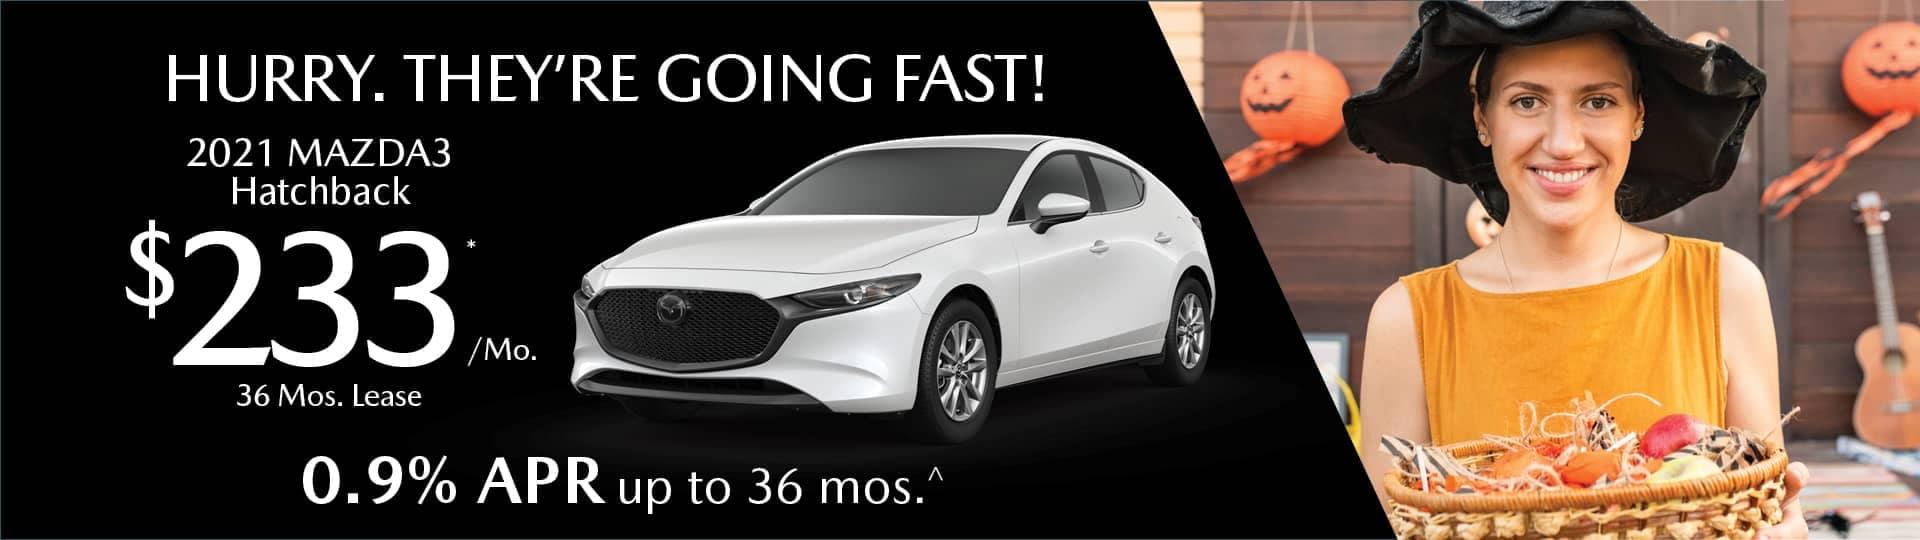 hurry going fast 2021 mazda3 hatchback .9% apr